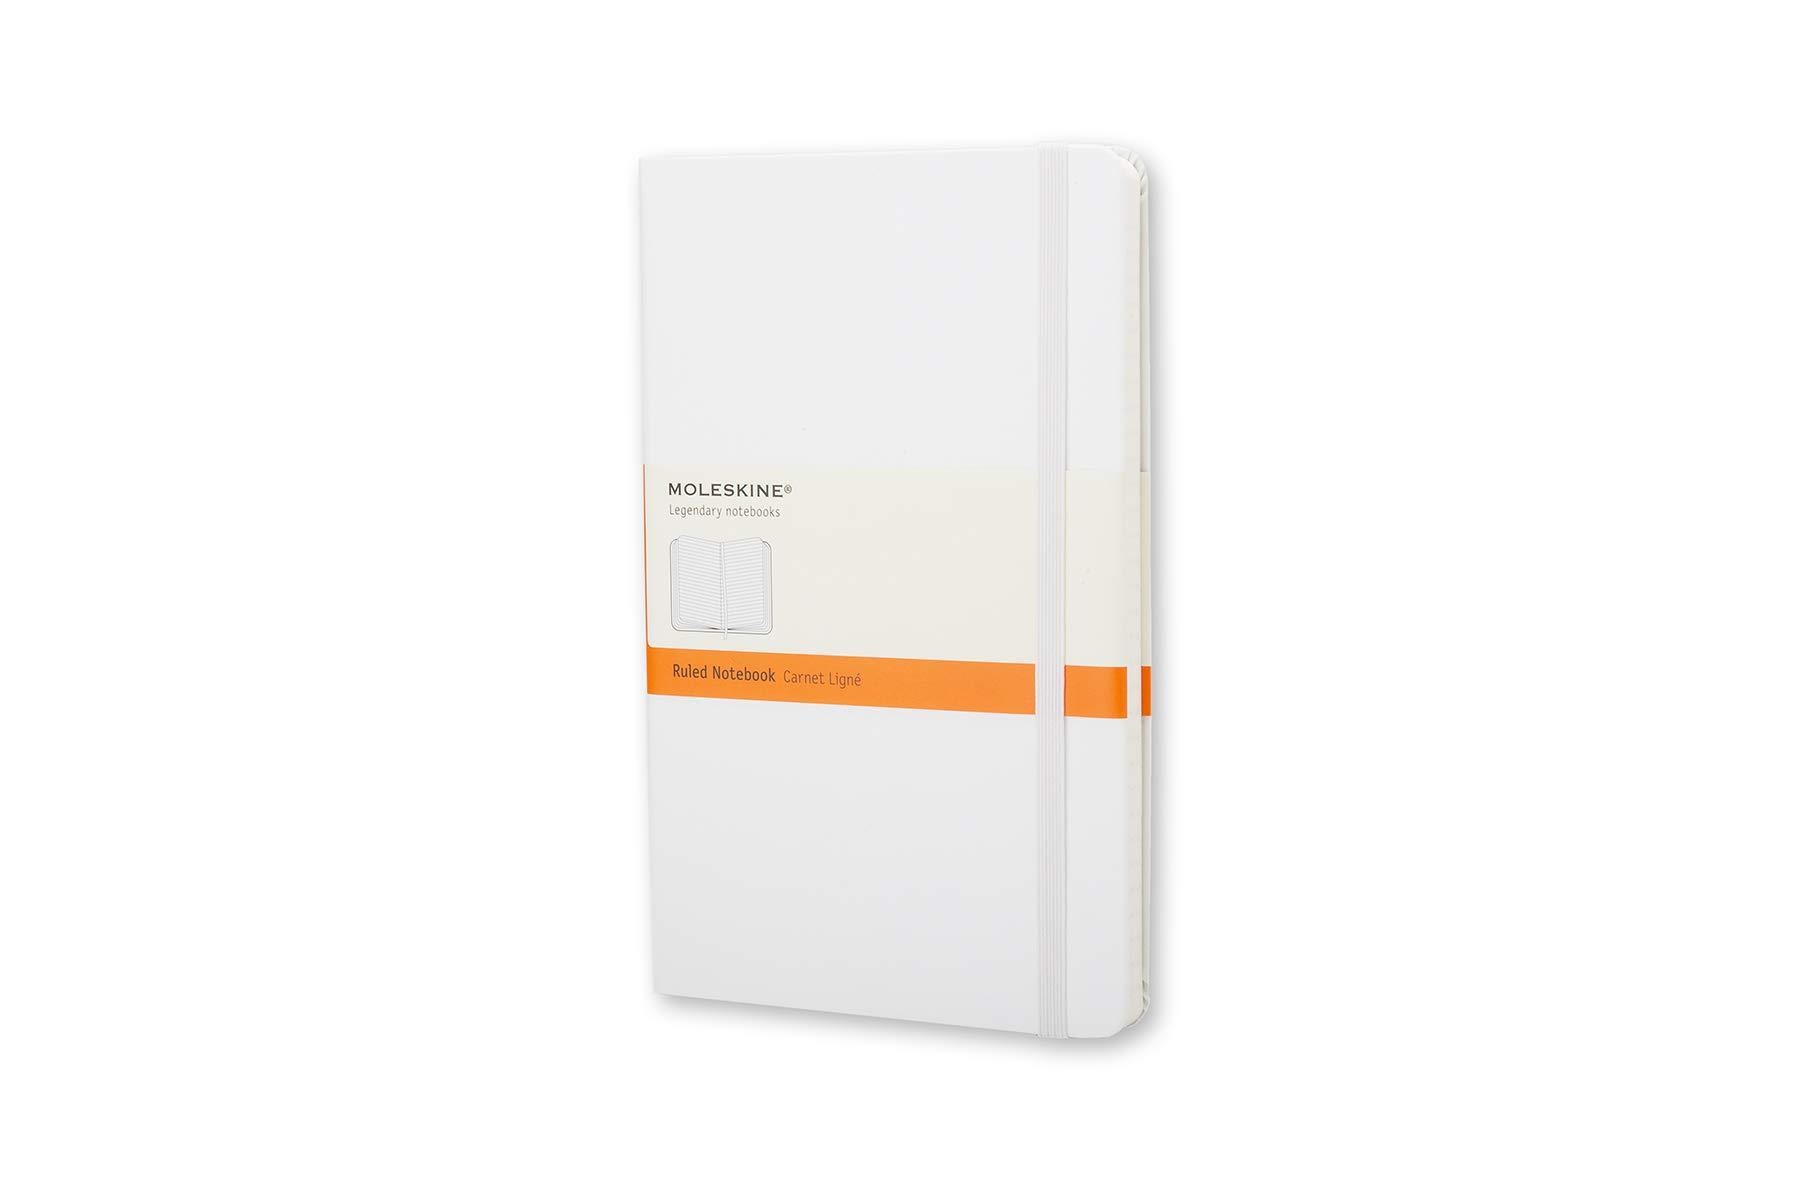 Moleskine Classic Notebook, Hard Cover, Large (5'' x 8.25'') Ruled/Lined, White by Moleskine (Image #1)